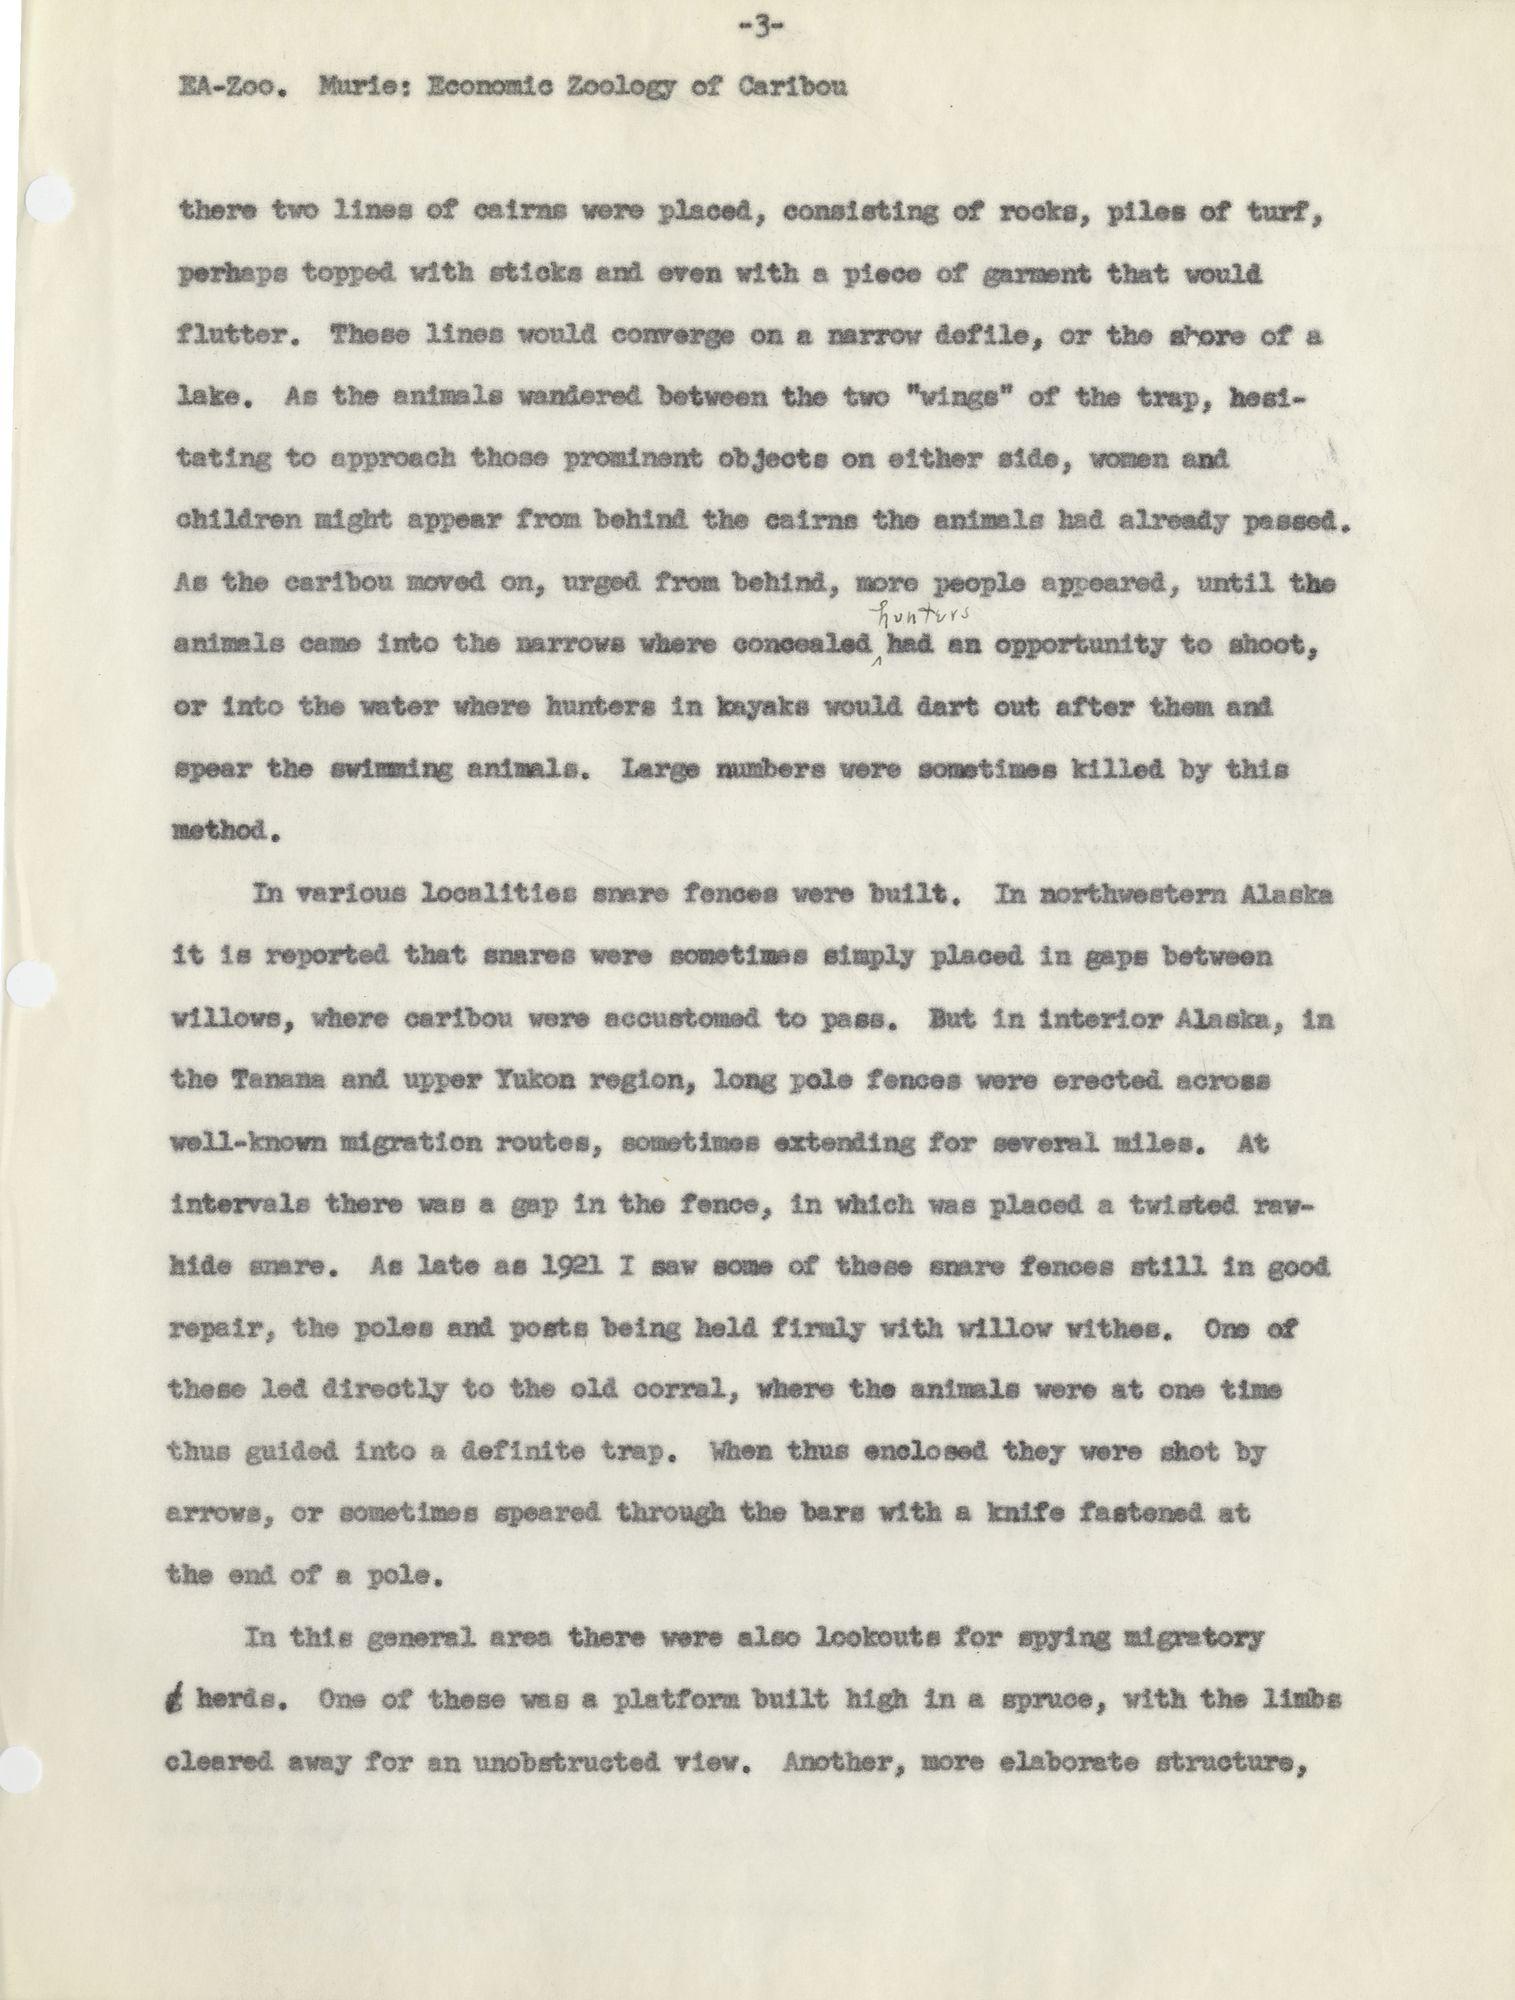 Part I Terrestrial Zoology Encyclopedia Arctica 3 League Volans K 440 003 Vol Iii 0084